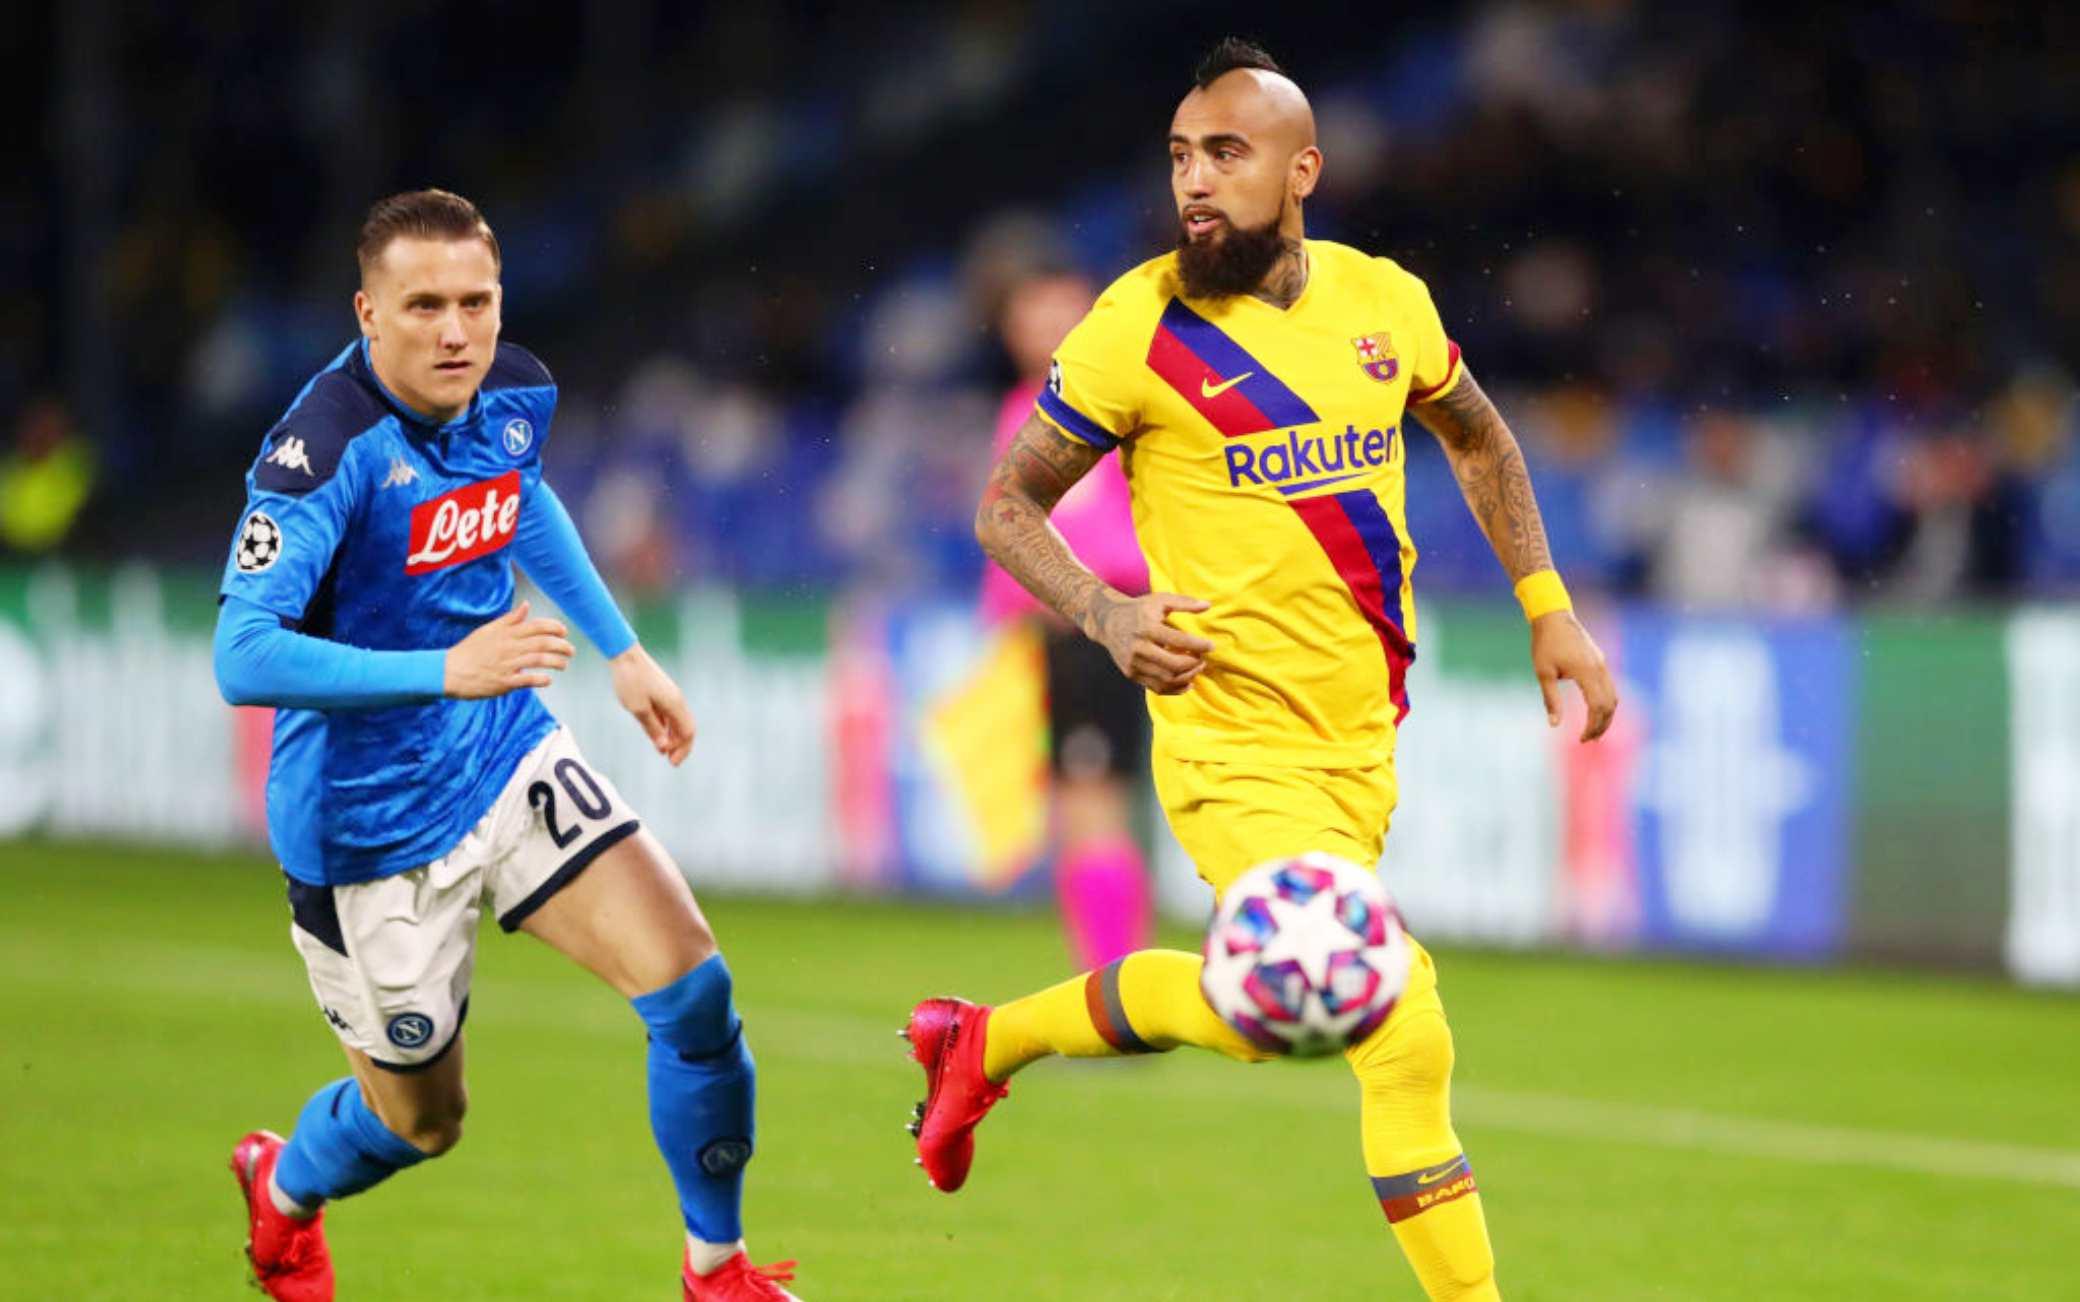 Napoli-Barcellona 1-1, a Mertens risponde Griezmann